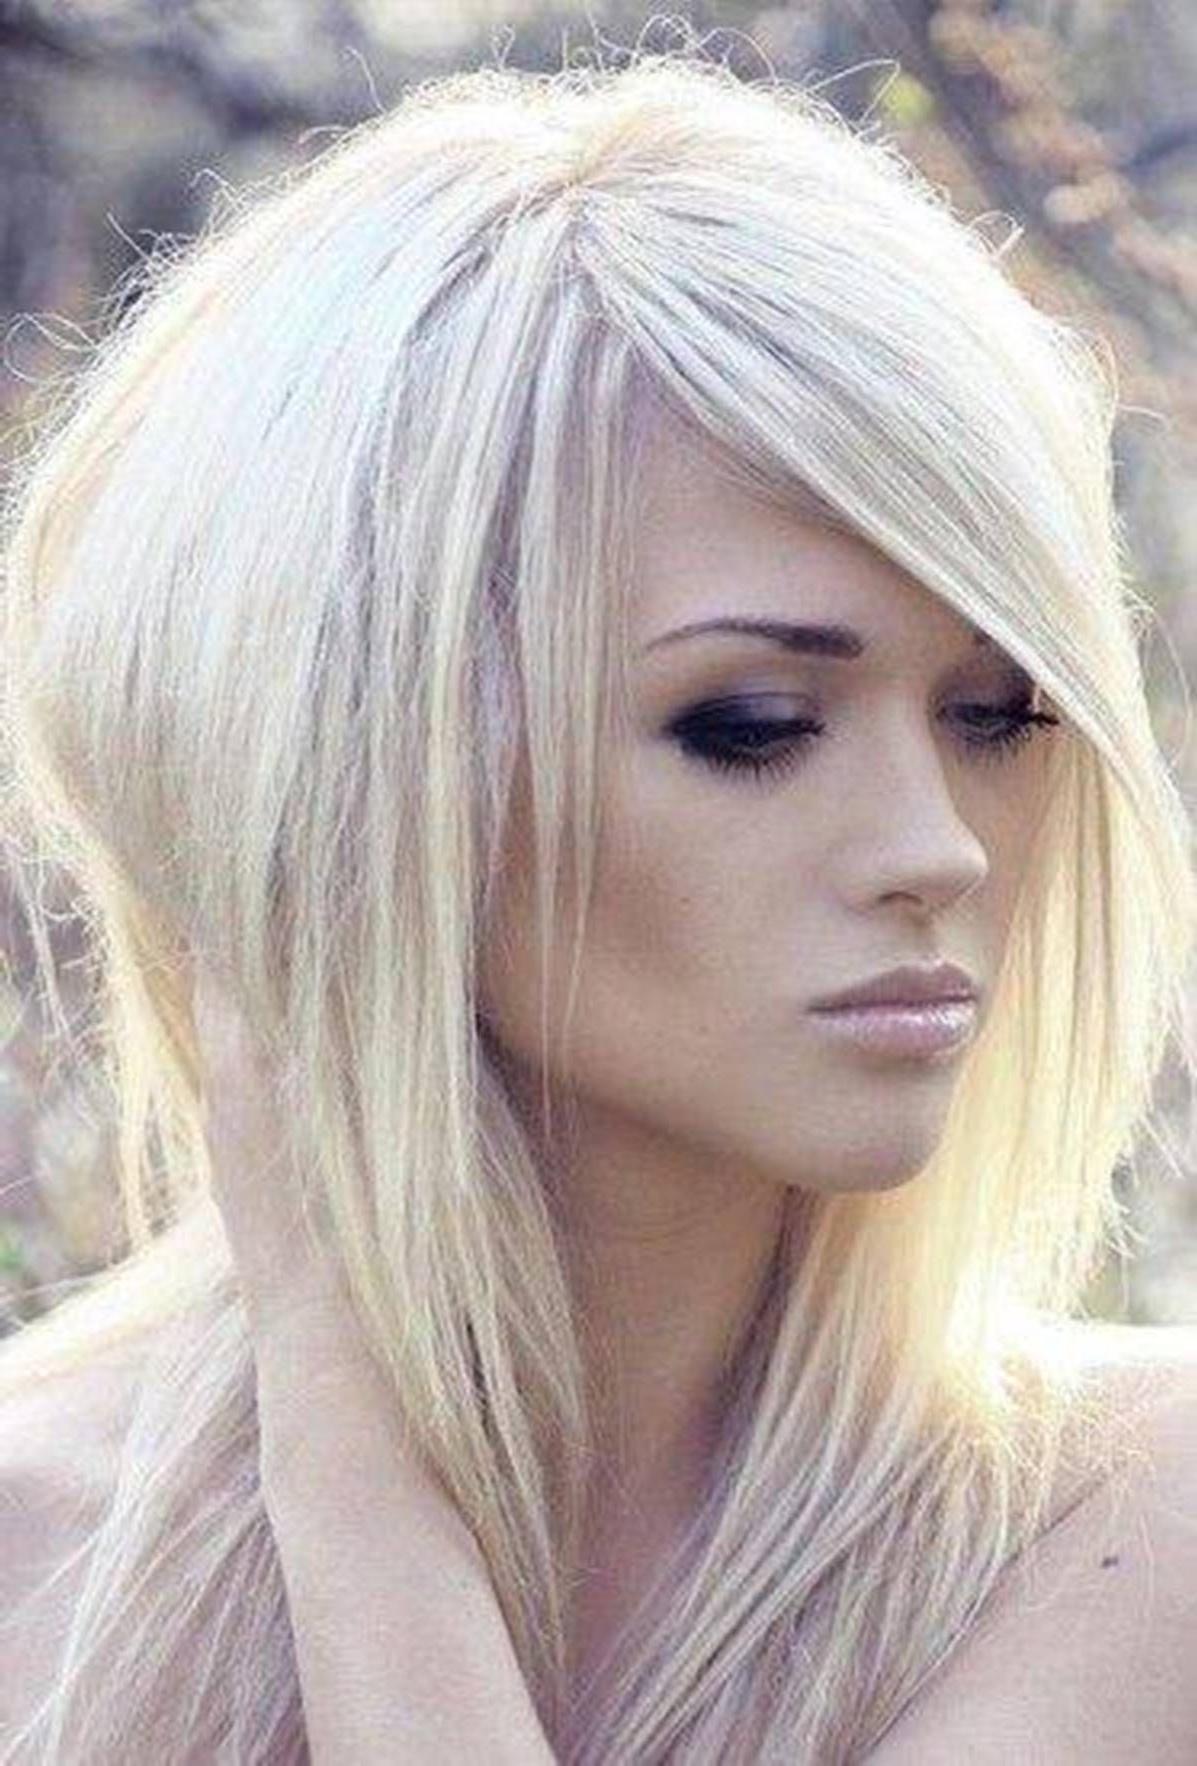 [%Preferred Retro Shag Hairstyles In Blonde Long Shag Hairstyles [ Waterbabiesbikini ] #beauty|Blonde Long Shag Hairstyles [ Waterbabiesbikini ] #beauty In Trendy Retro Shag Hairstyles%] (View 1 of 15)